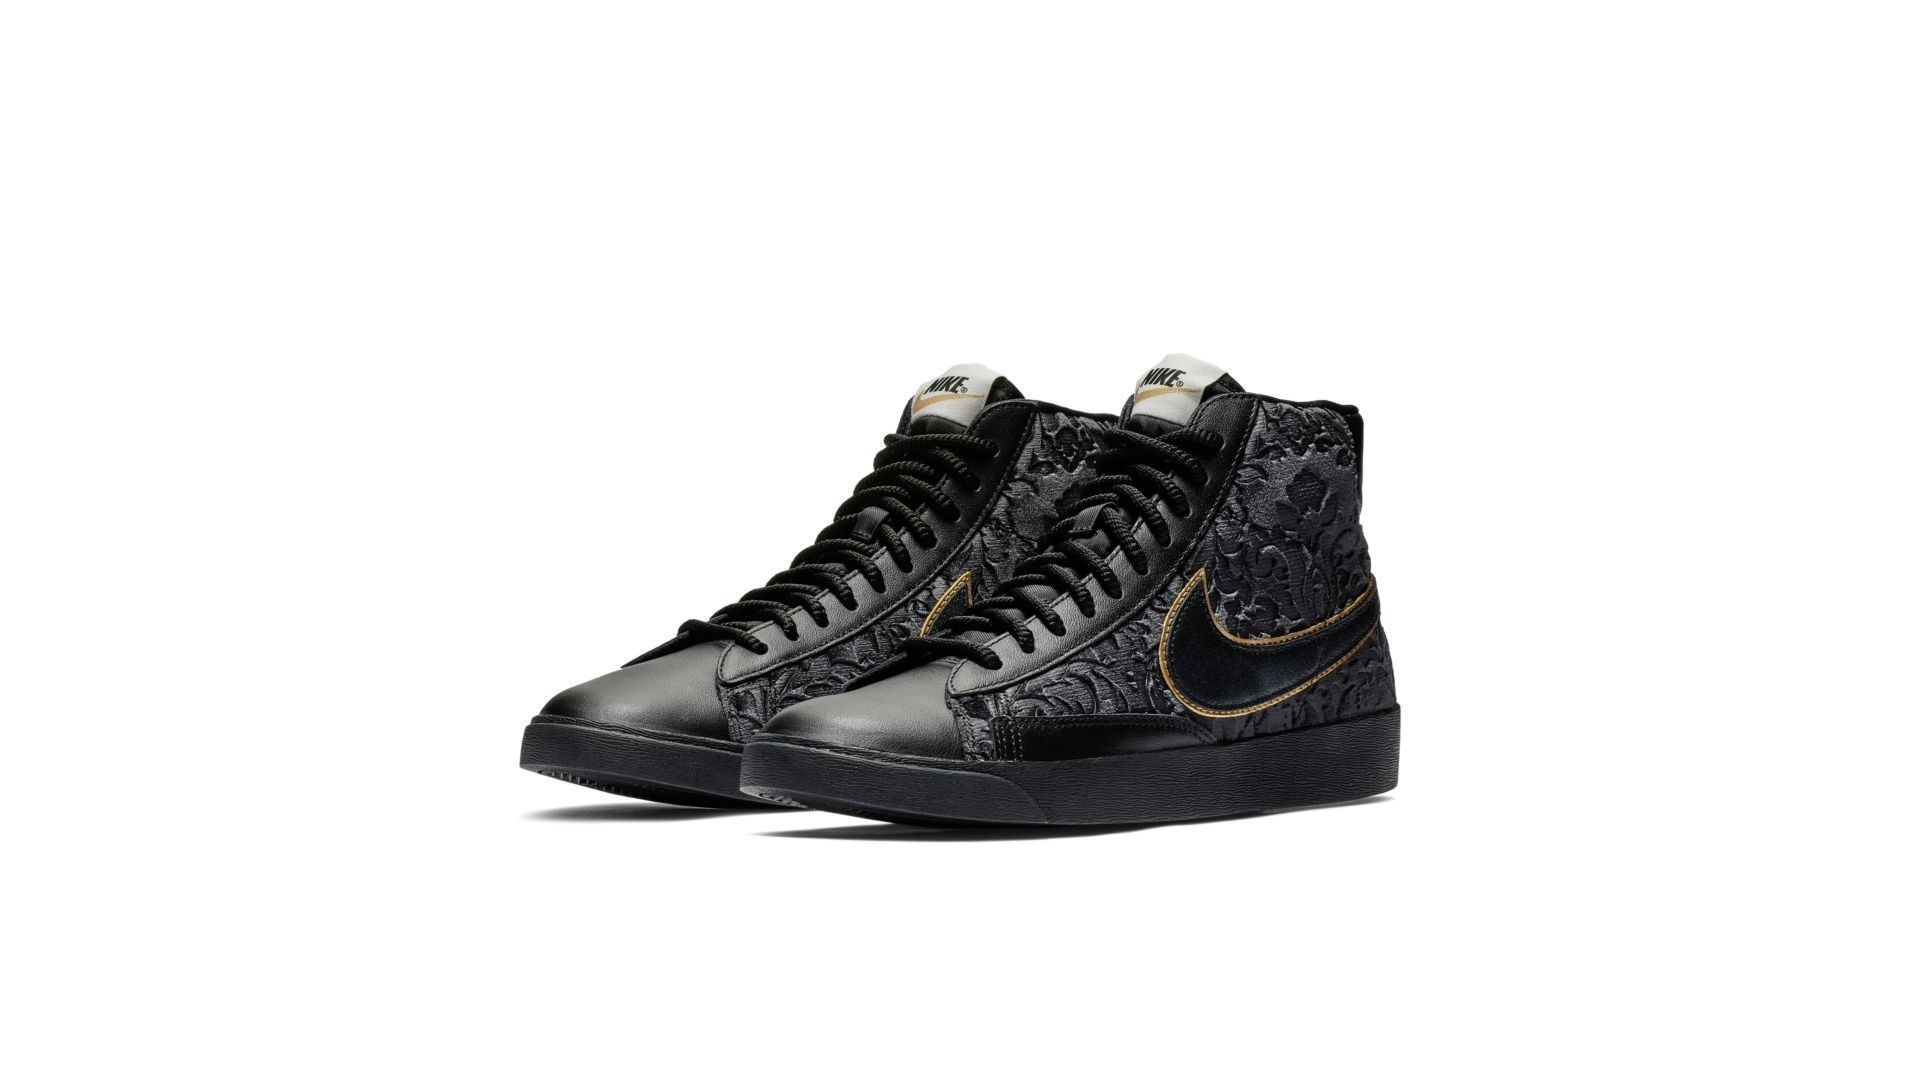 enlace Preescolar Salvaje  Nike Blazer Mid Velvet Black Metallic Gold (W) (AV8437-001) | Sneakers4u